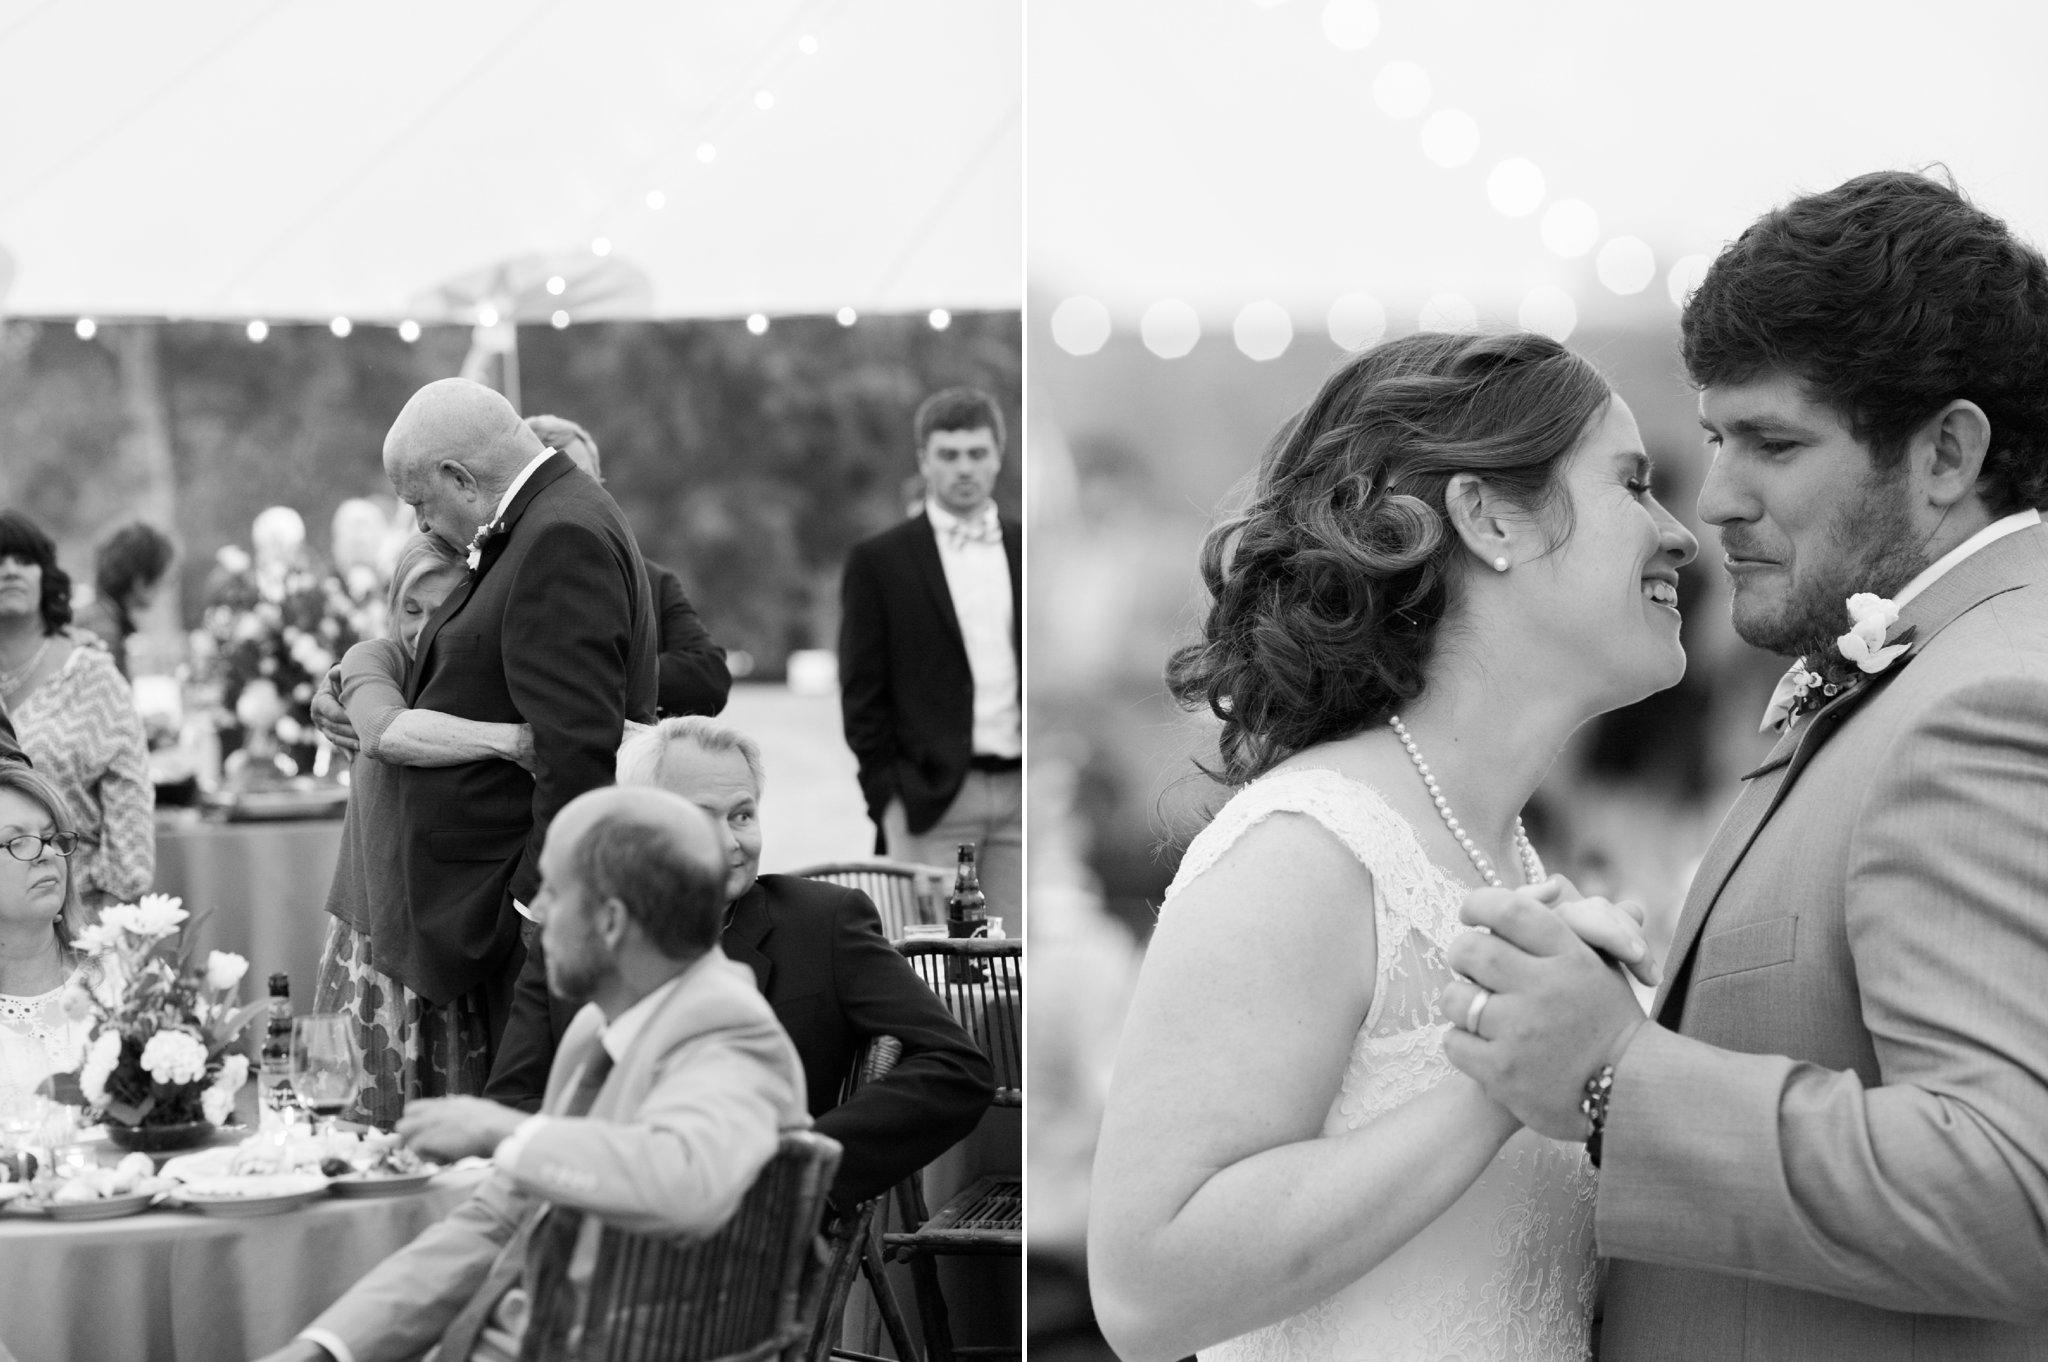 ecila farm wedding albany georgia wedding photographer shannon griffin photography-8.jpg